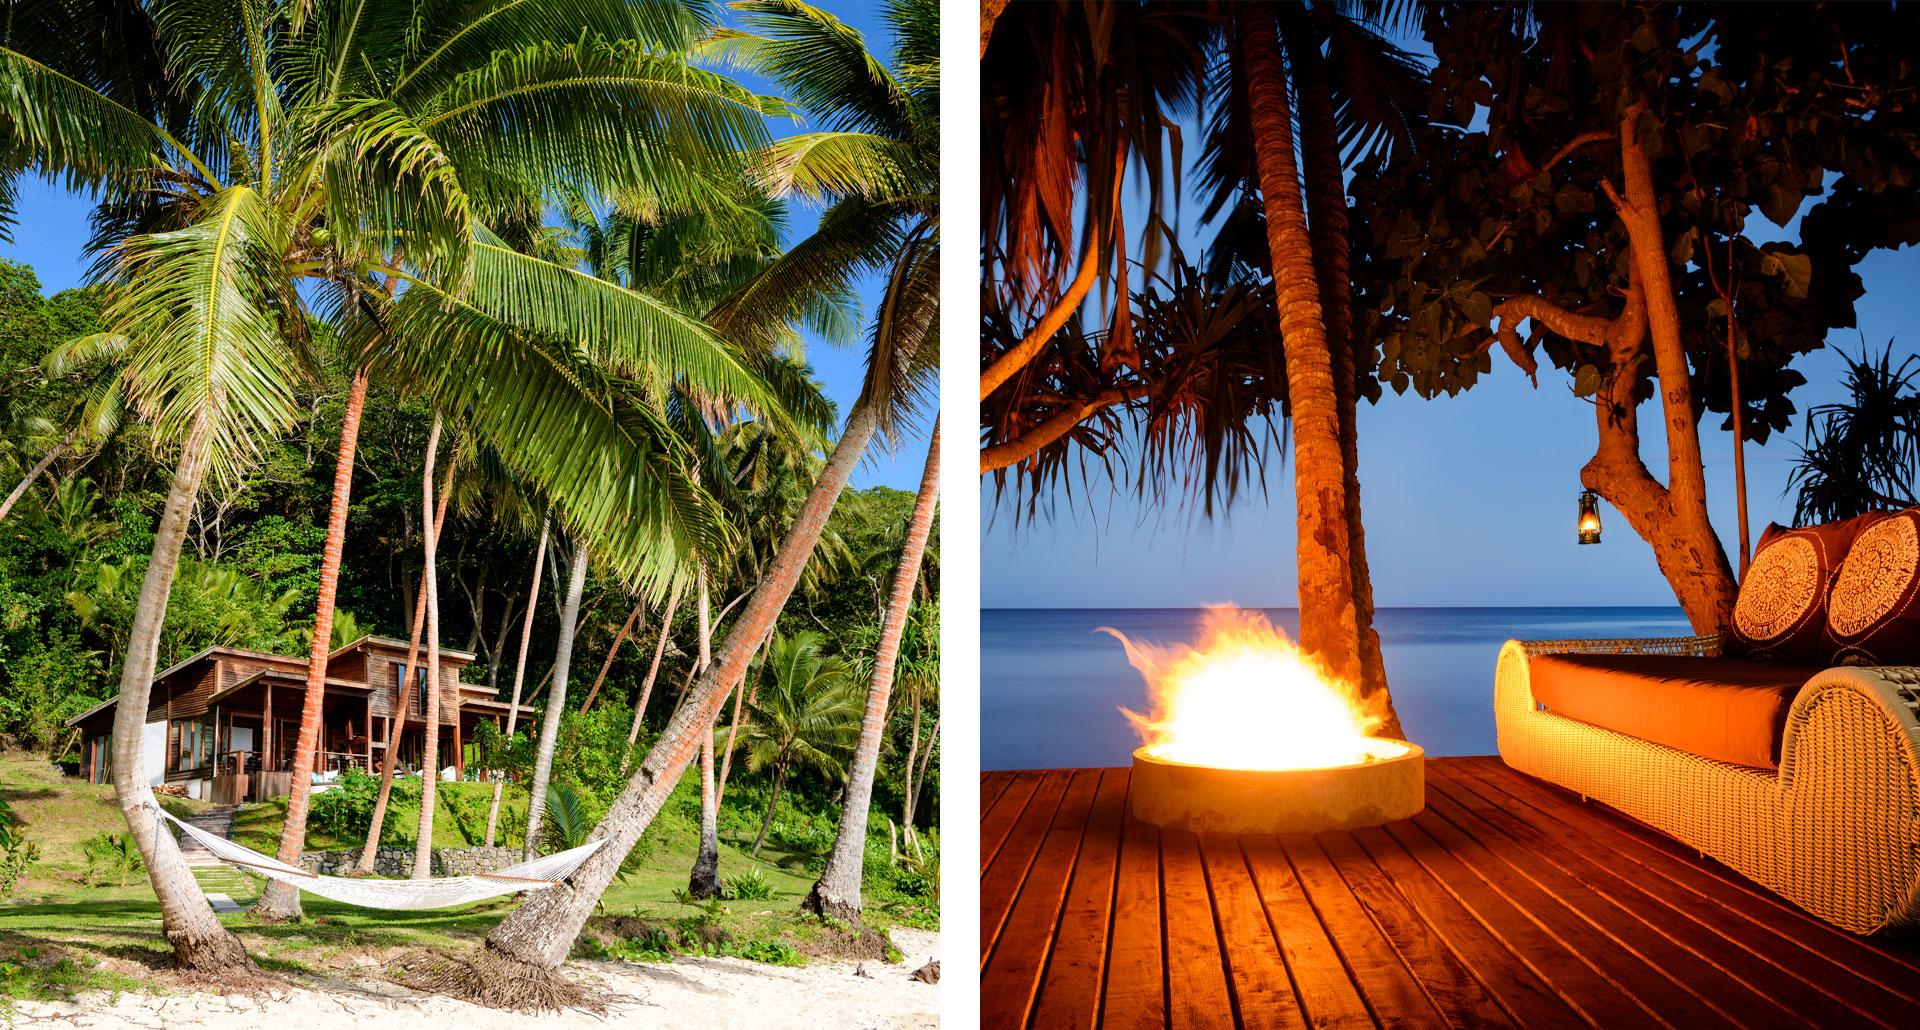 The Remote Resort - boutique hotel in Fiji